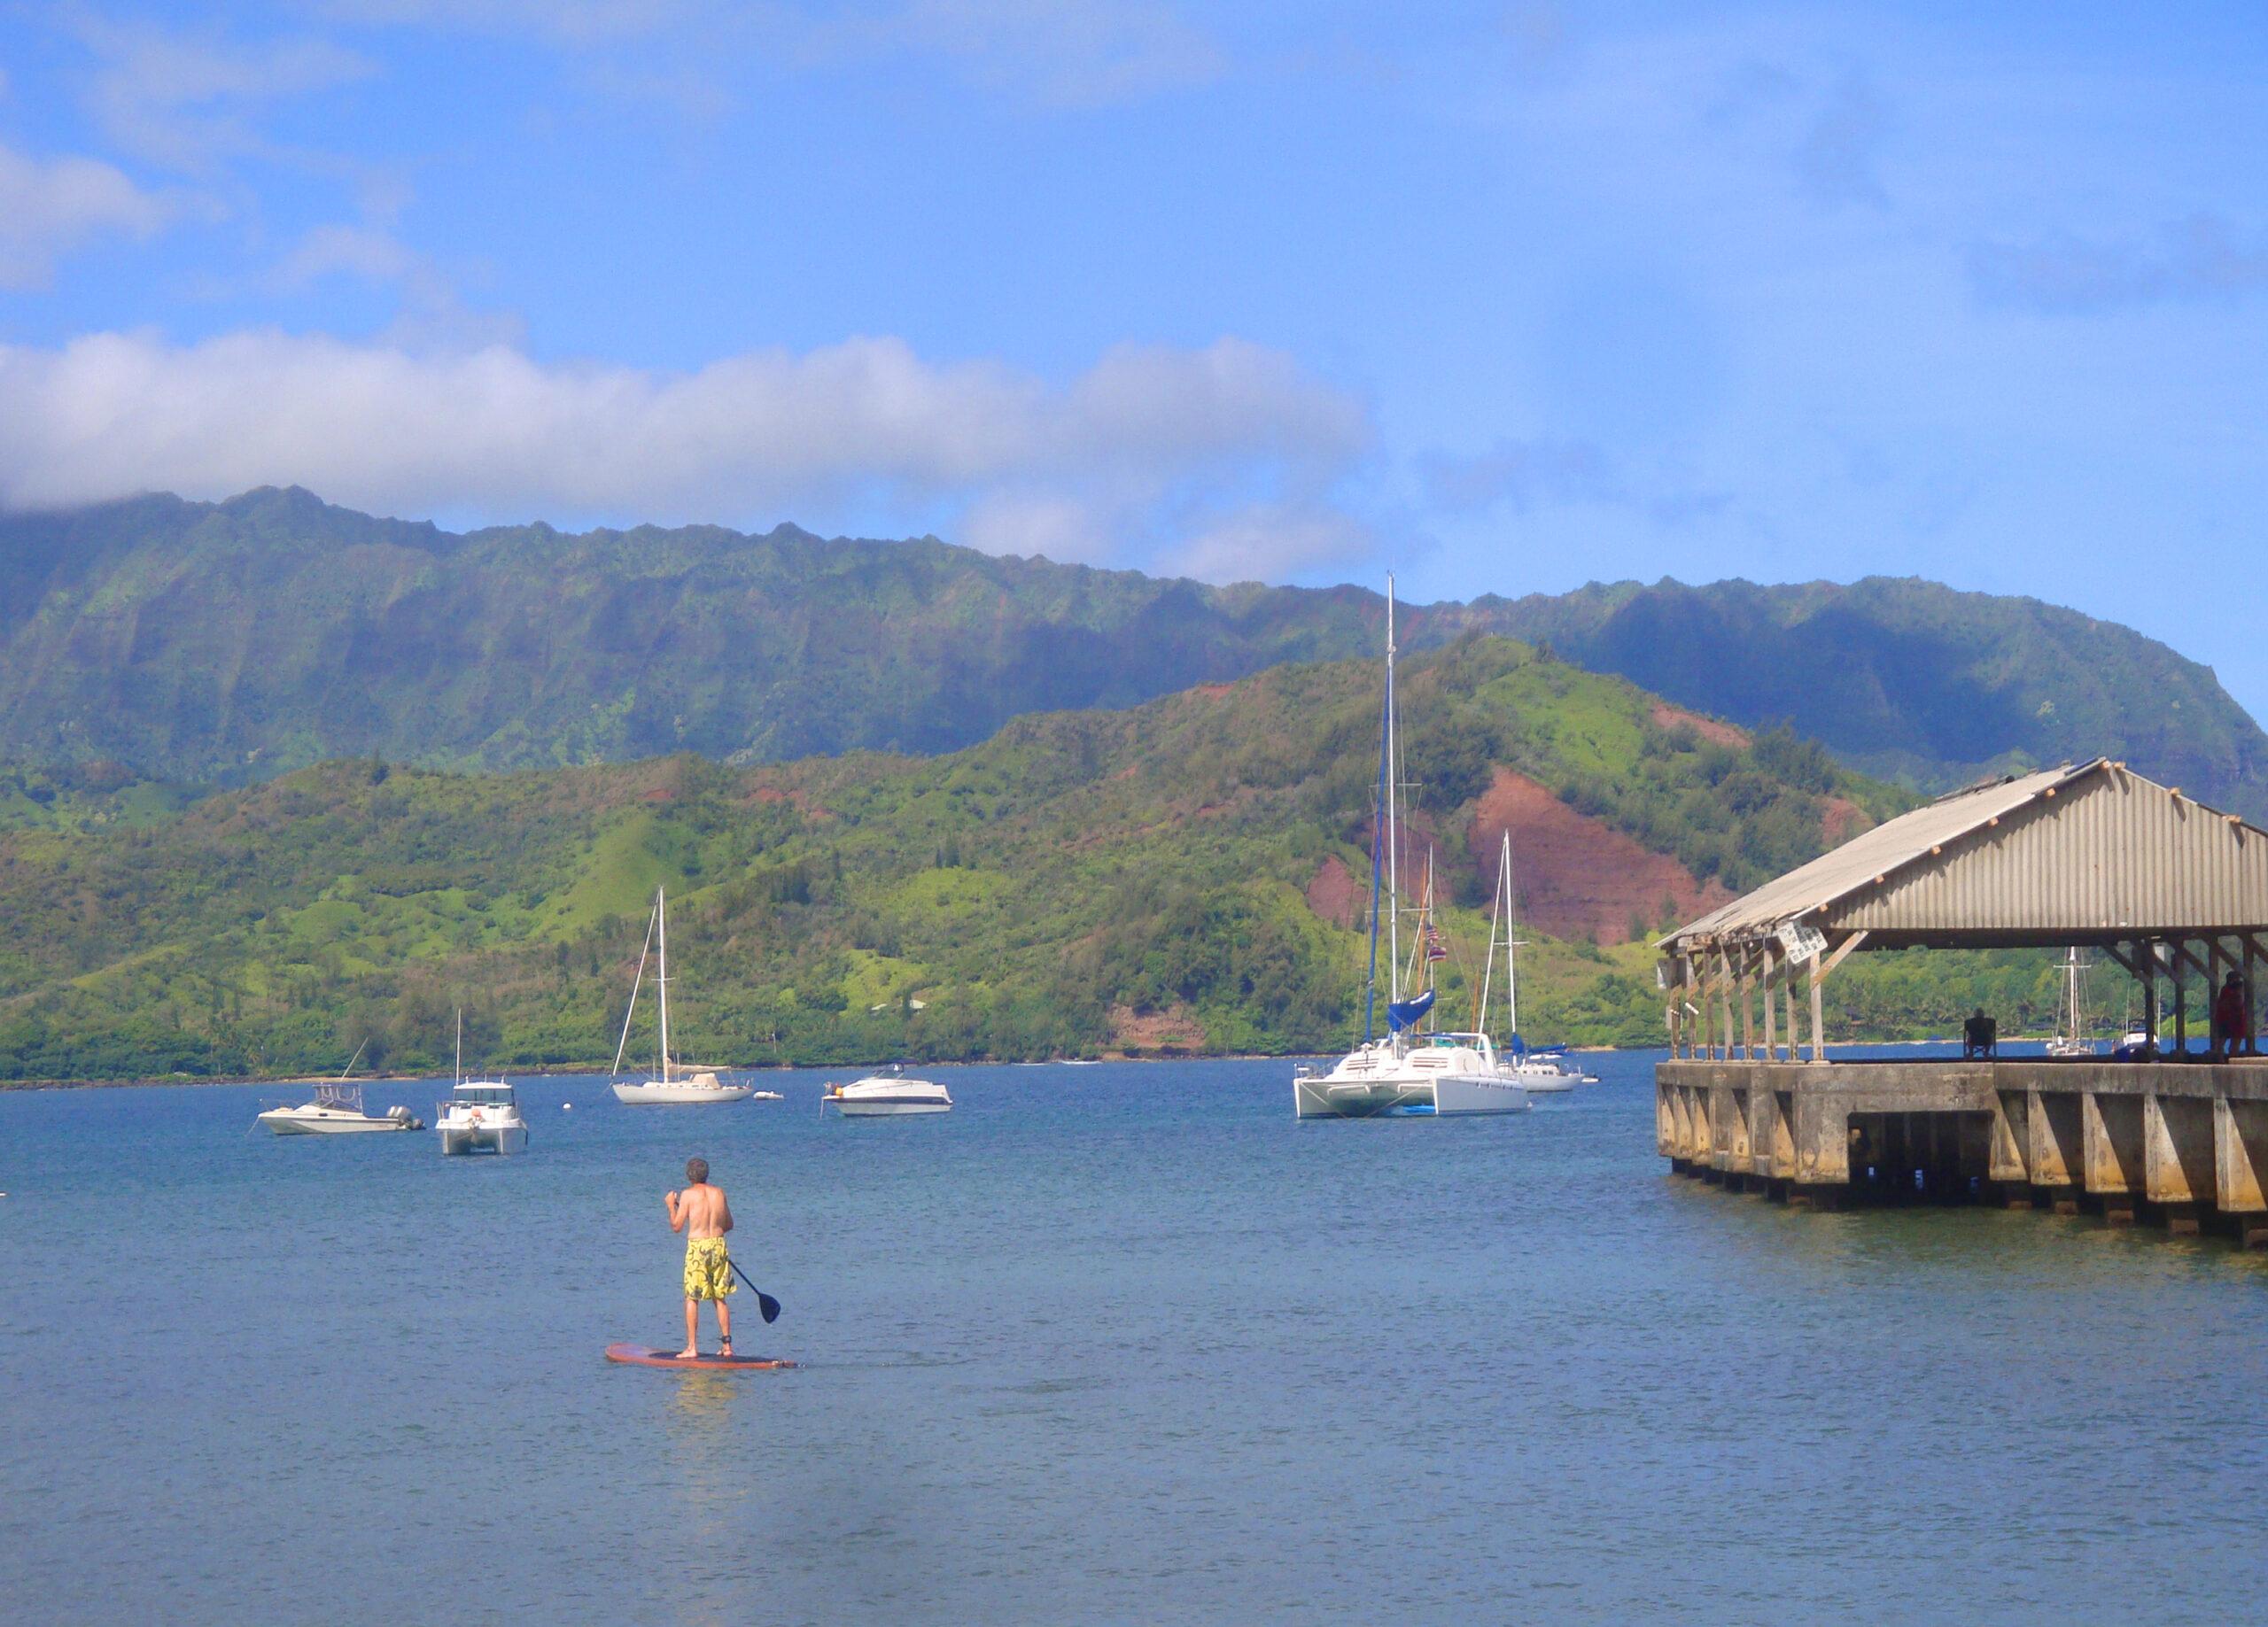 Stand up paddling near Hanalei Bay Pier